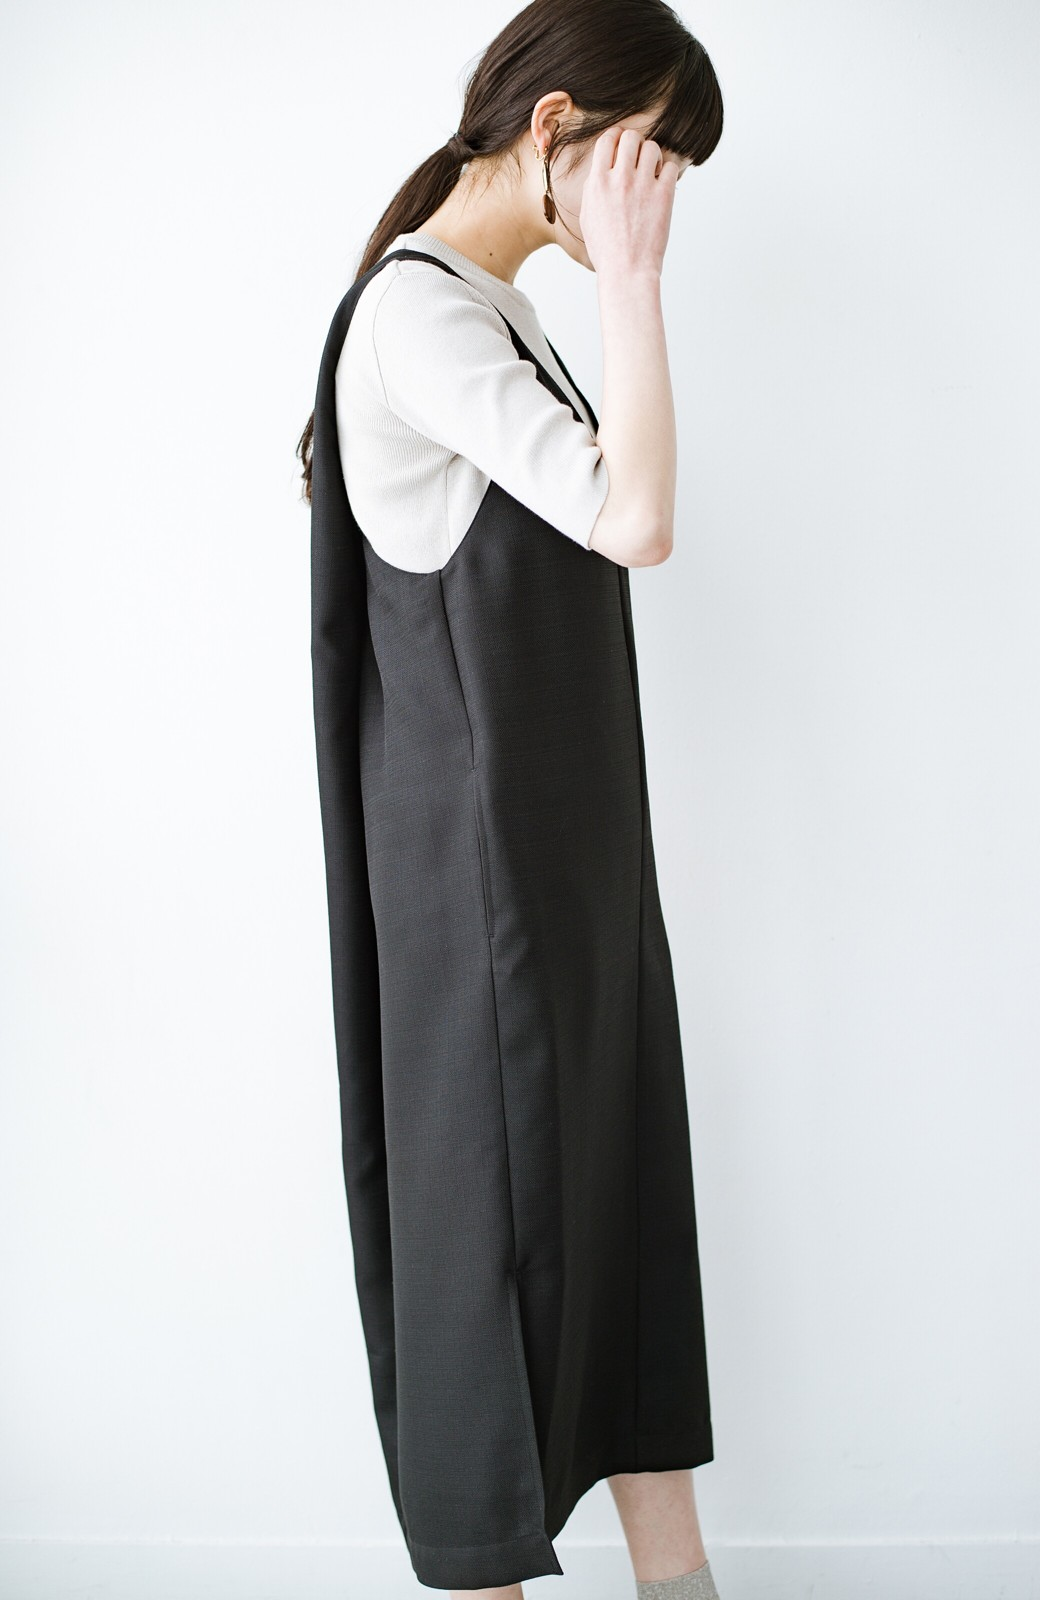 haco! 何てことないTシャツと重ねるだけでパッとかわいくなれる 魔法のようなジャンパースカート <ブラック>の商品写真17